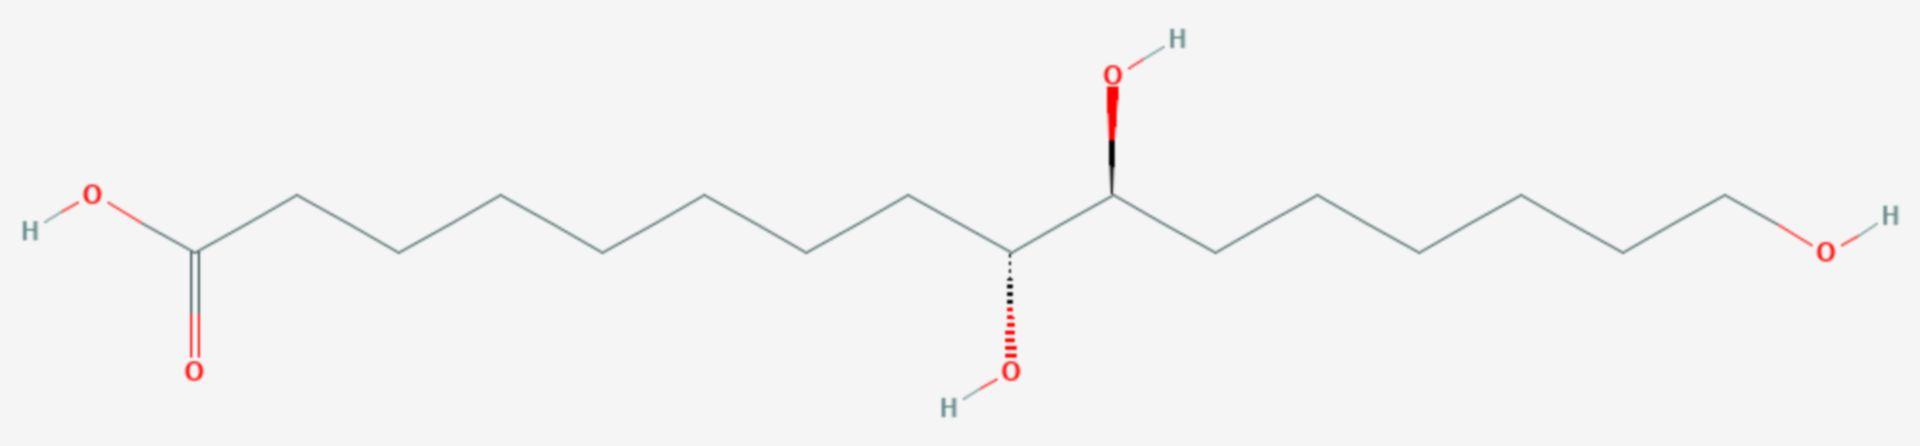 Aleuritinsäure (Strukturformel)